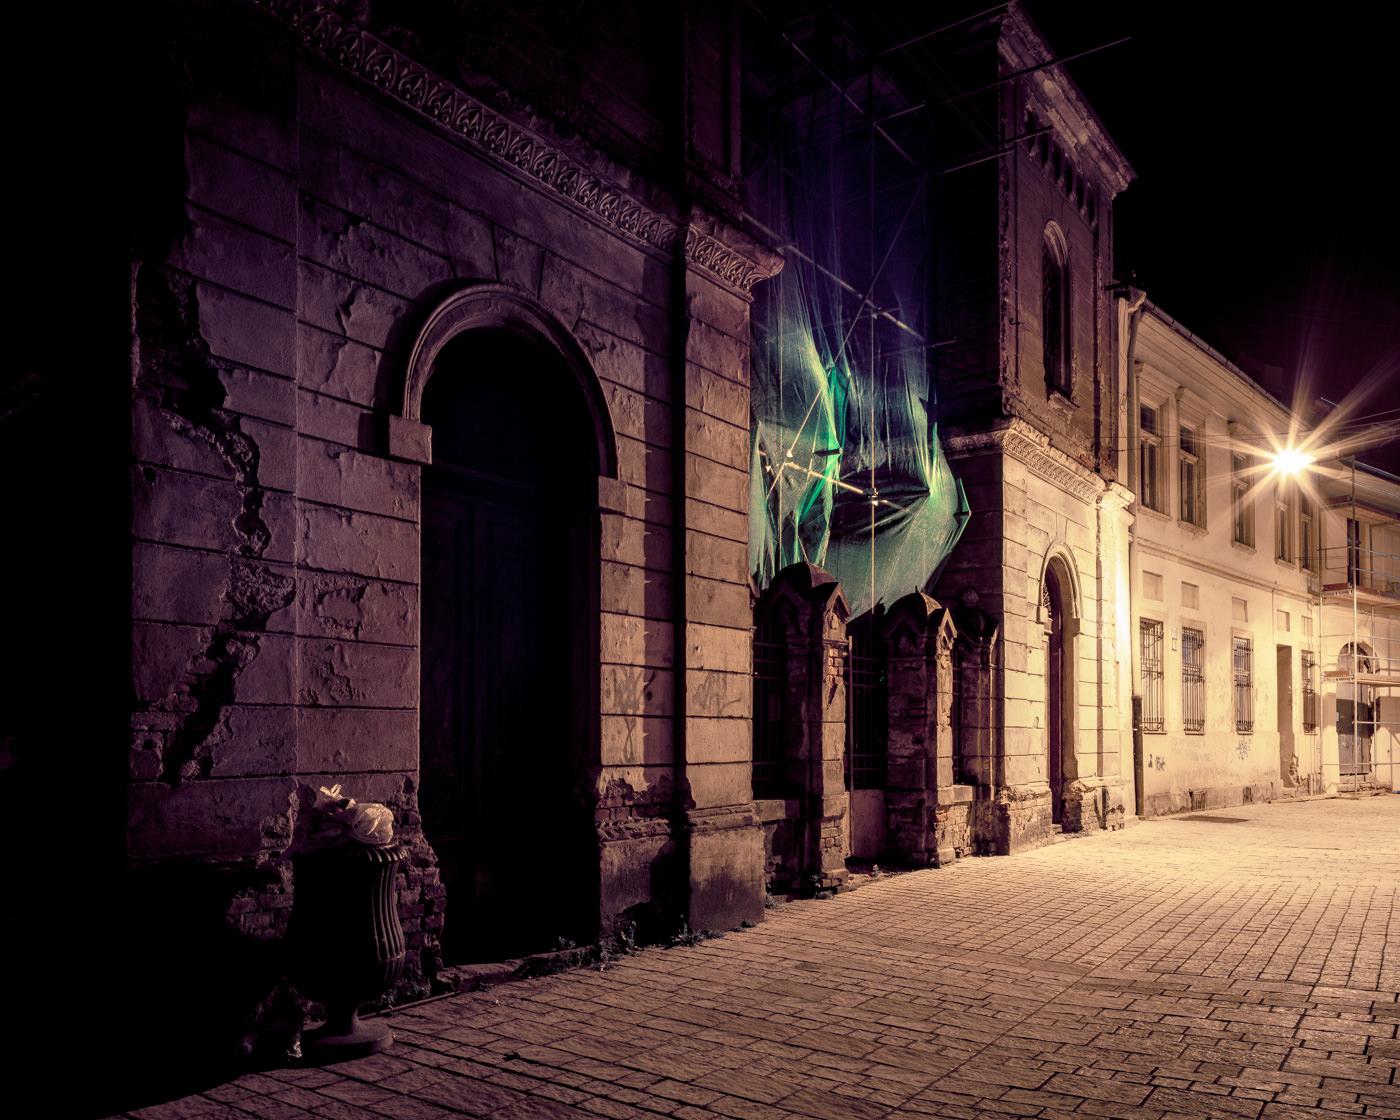 """Synagogue Košice"" from the series Nylon Chrysalis, by William Mokrynski"